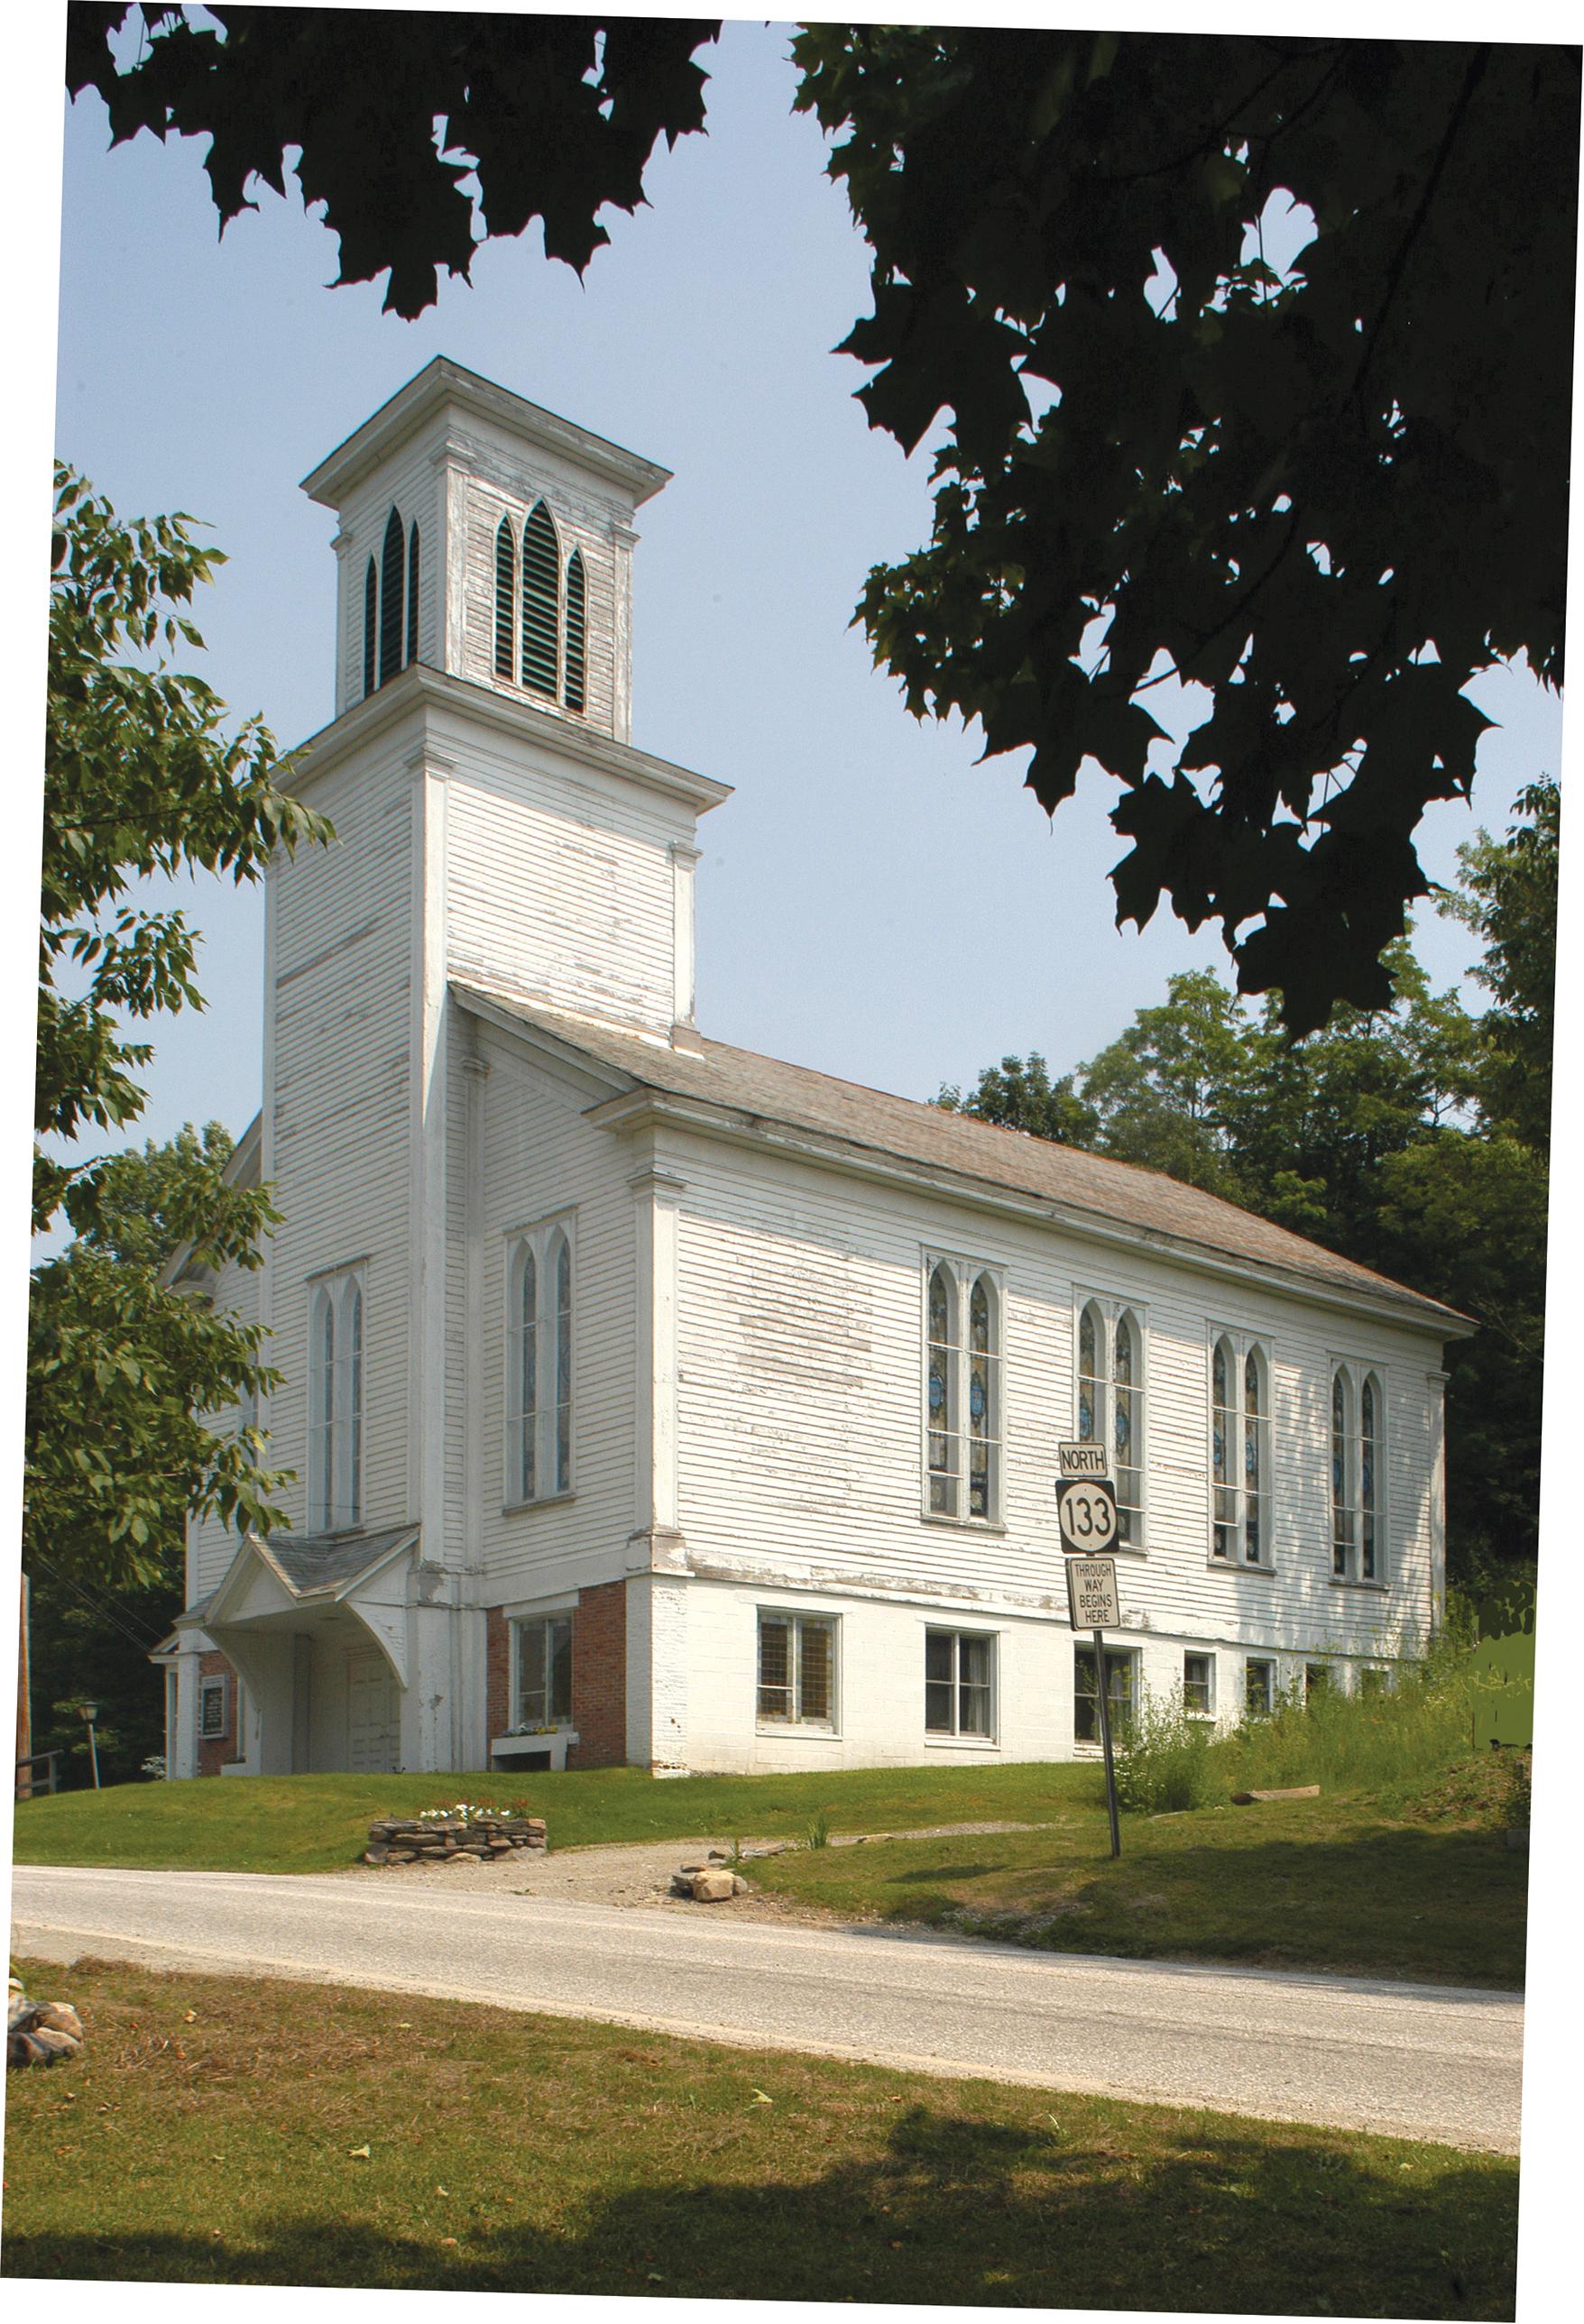 Pawlet Community Church